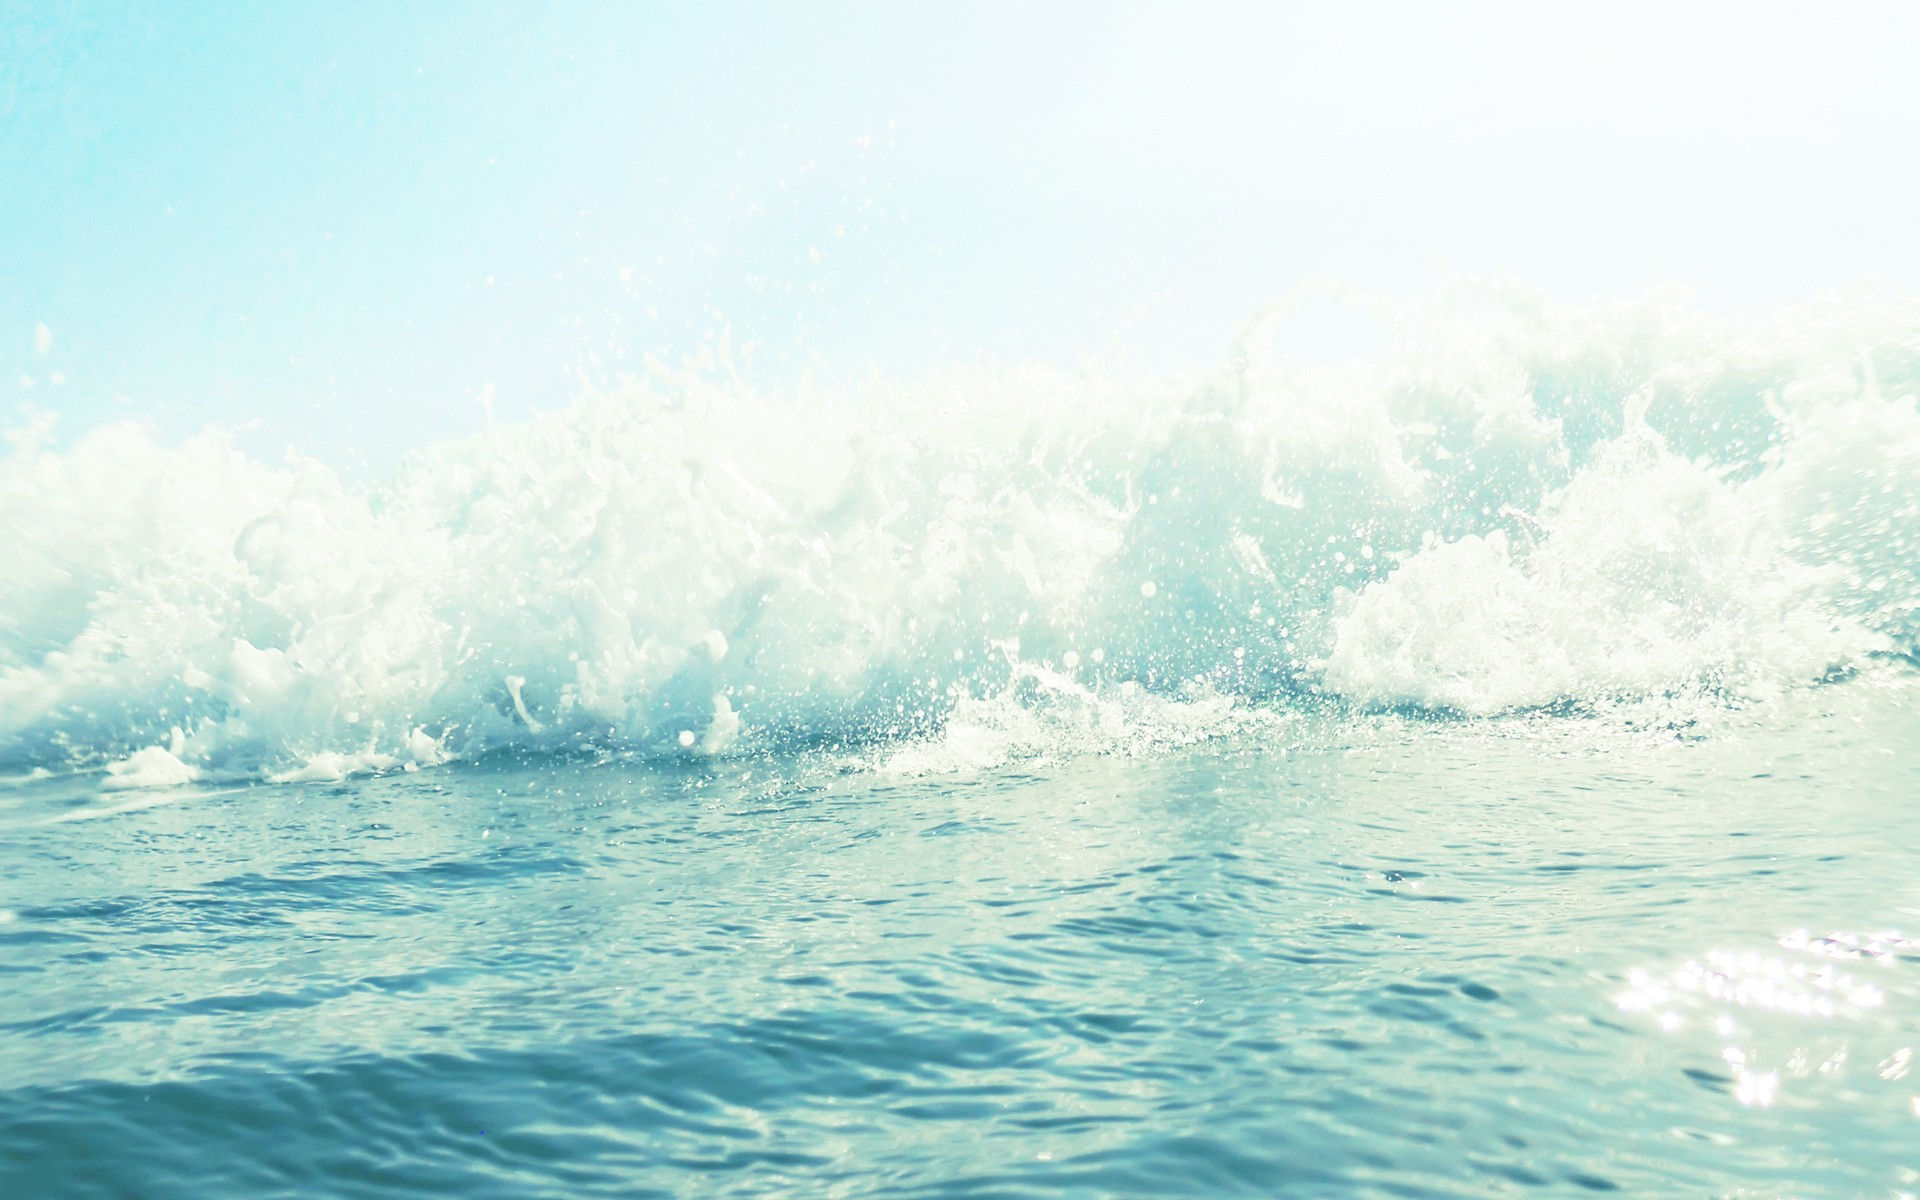 Ocean Wave Water drops bokeh wallpaper 1920x1200 1920x1200